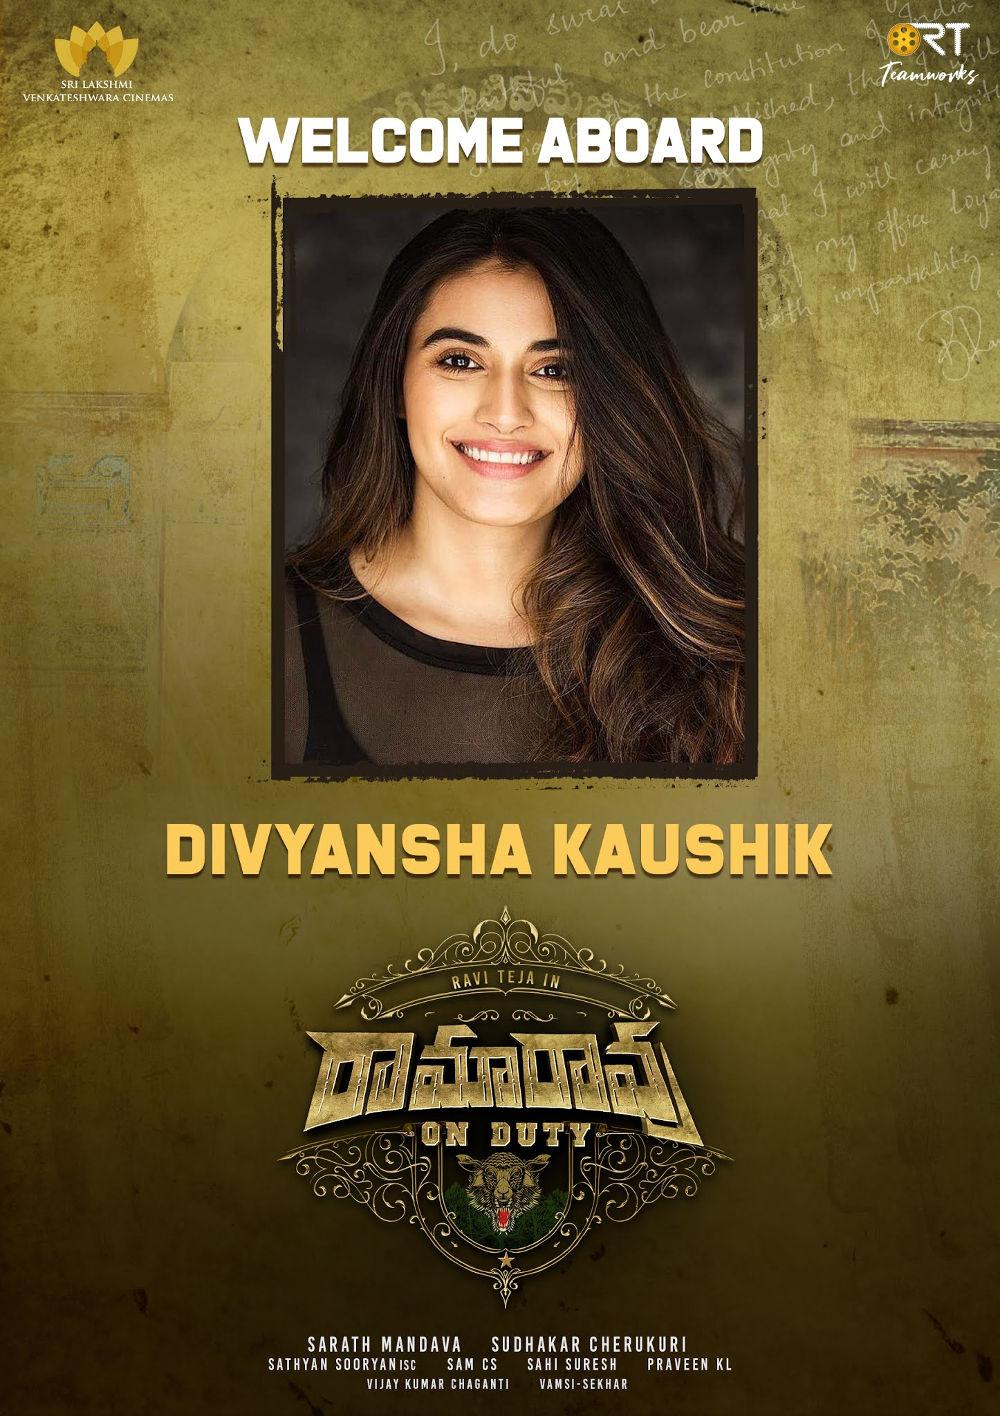 Actress Divyasha Kaushik In Ravi Teja Ramarao On Duty Movie